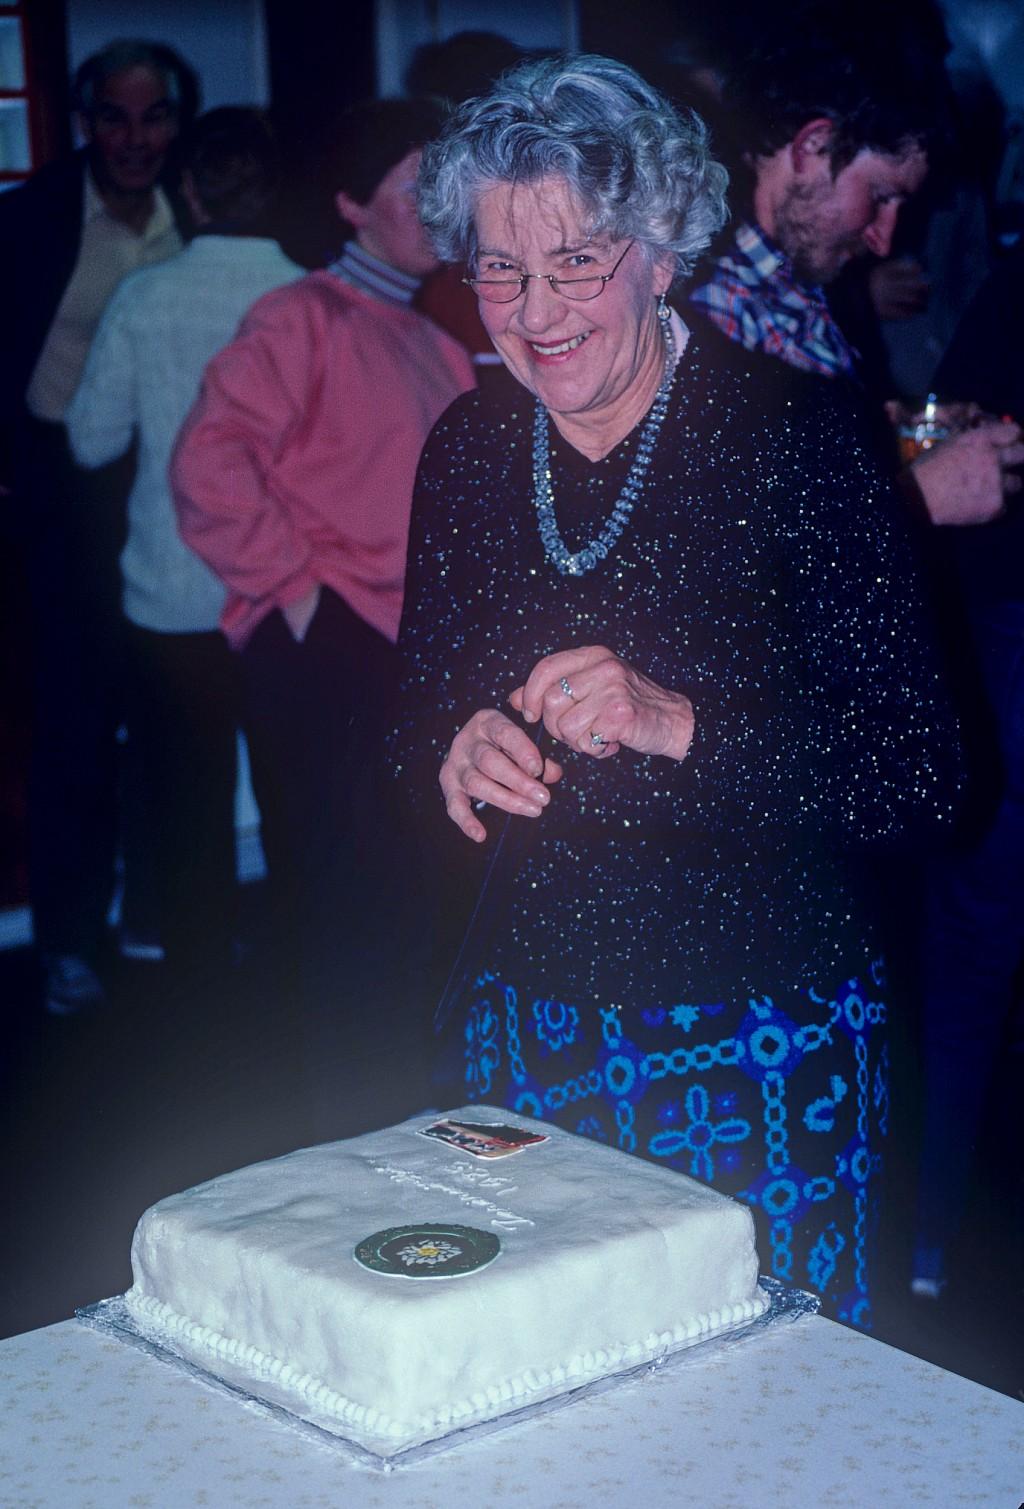 click on the photo to download the original image  1999-09 ttc511_Nancy Stevenson at TTC 80th anniversary celebrations Photo J L Anderson TTC collection